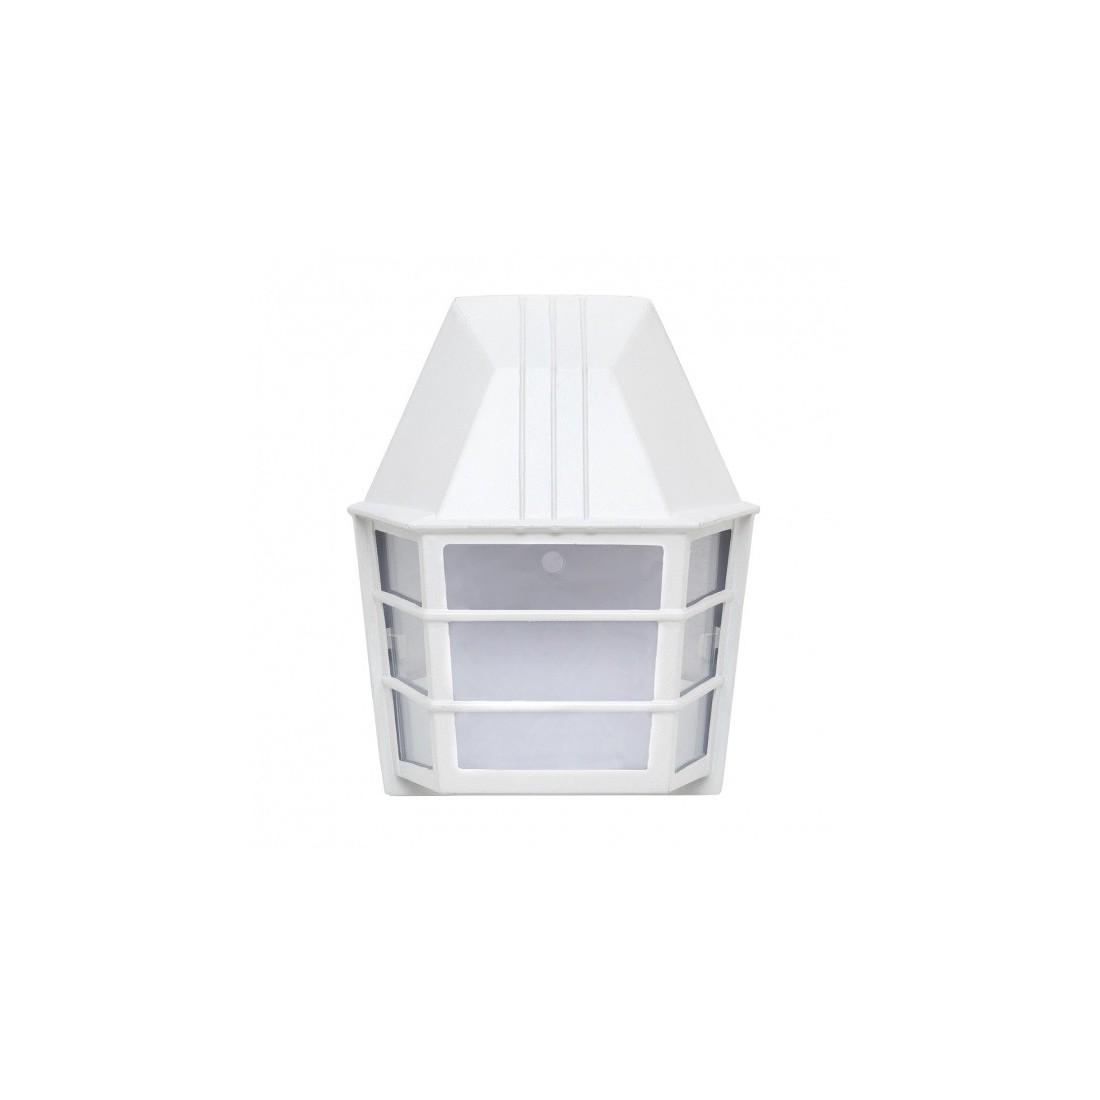 L mparas acr licas outlet l mparas de techo ofertas - Ofertas lamparas techo ...